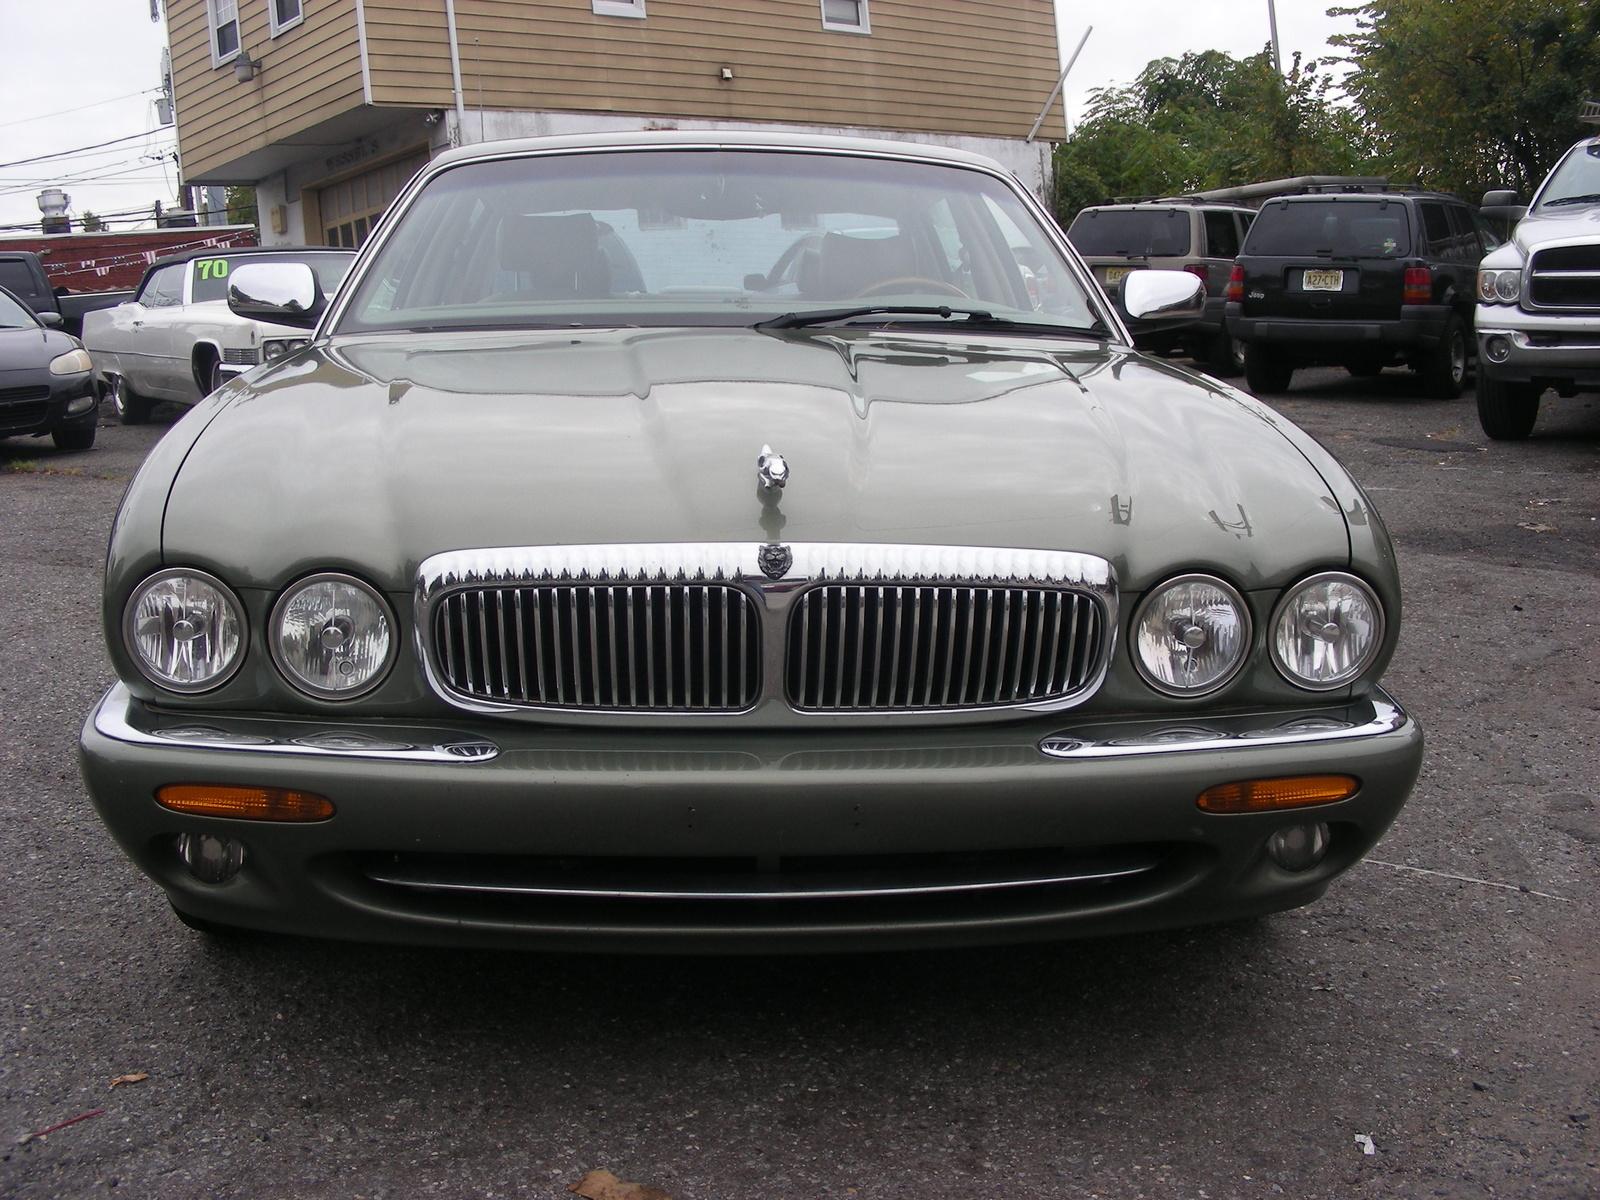 Picture of 1999 Jaguar XJ-Series 4 Dr Vanden Plas